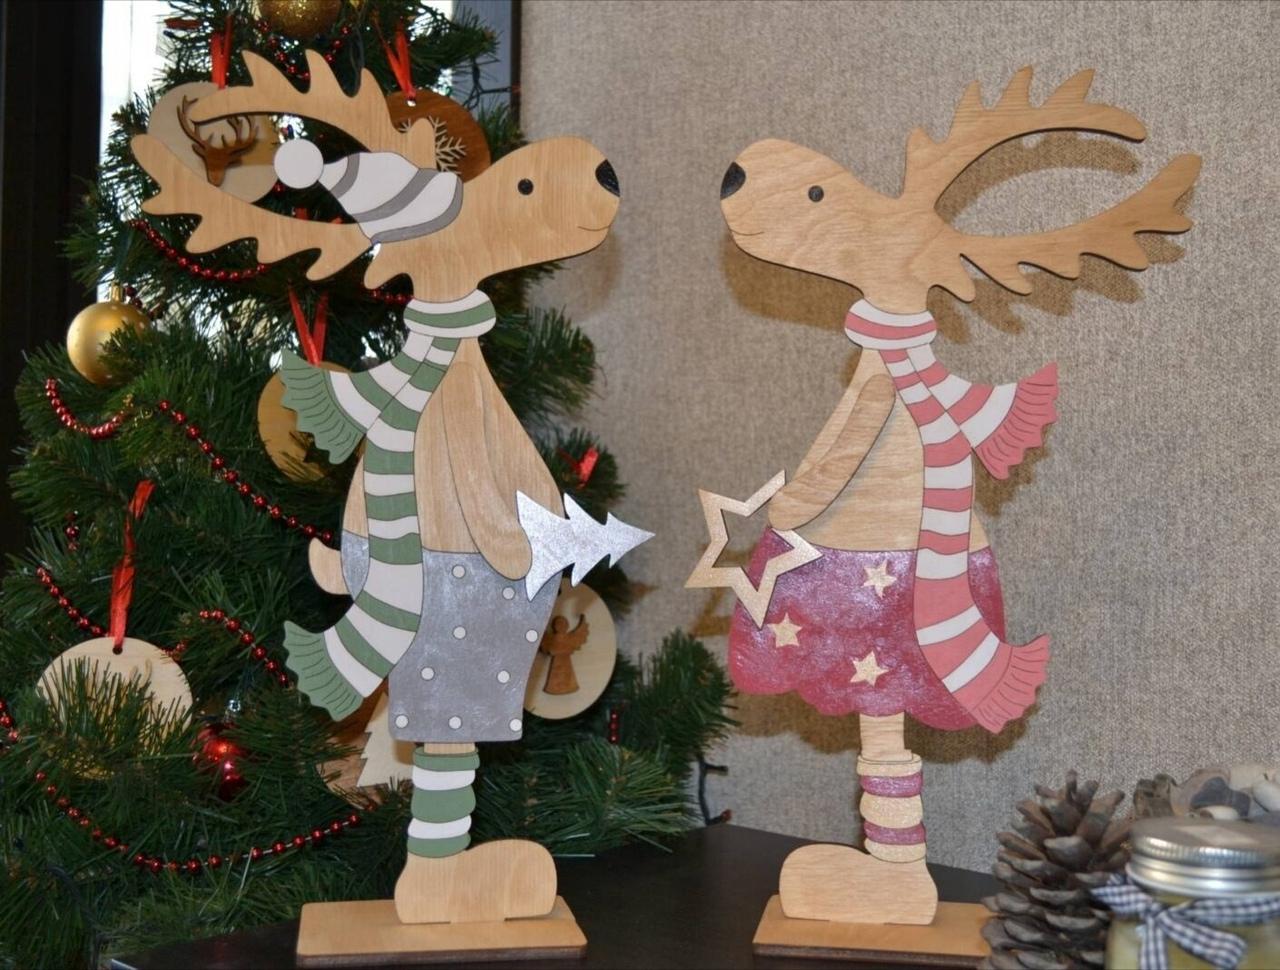 Laser Cut Wooden Deer Christmas Ornaments Free Vector